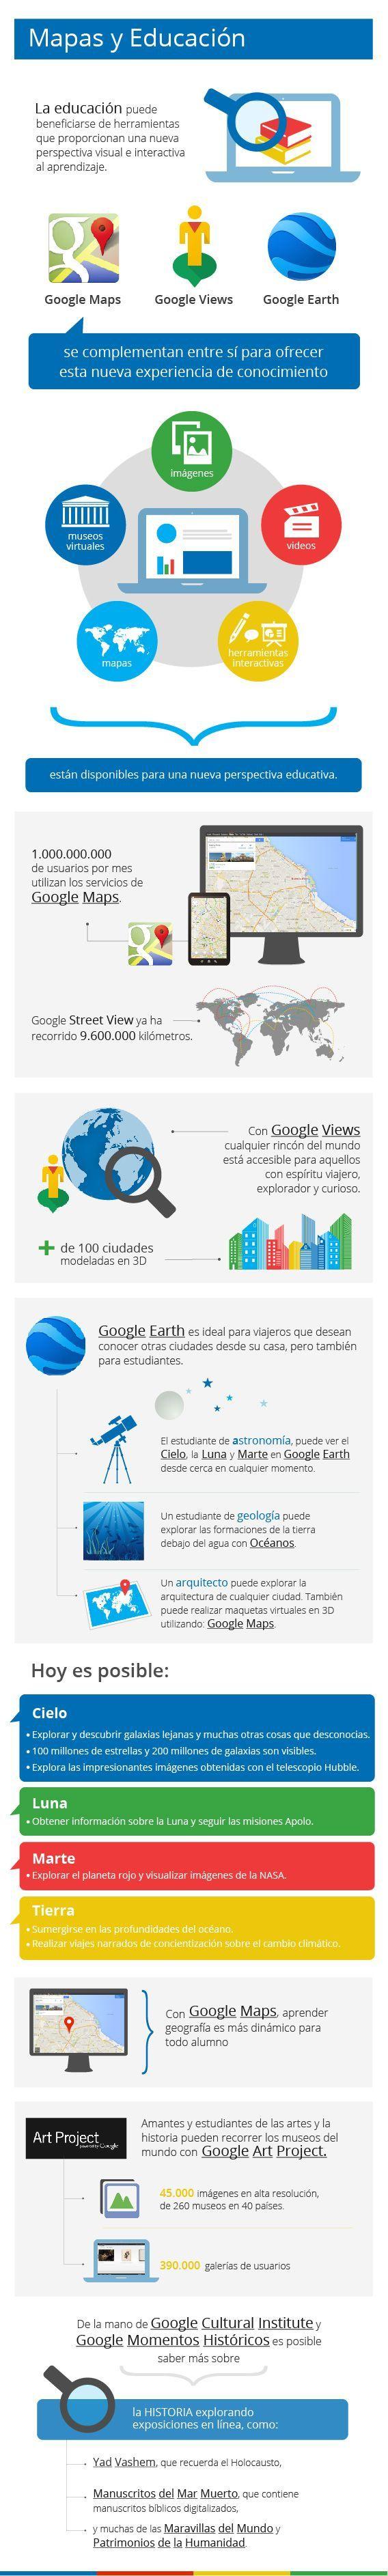 EducaciónMapas20BeneficiosHerramientas-Infografía-BlogGesvin